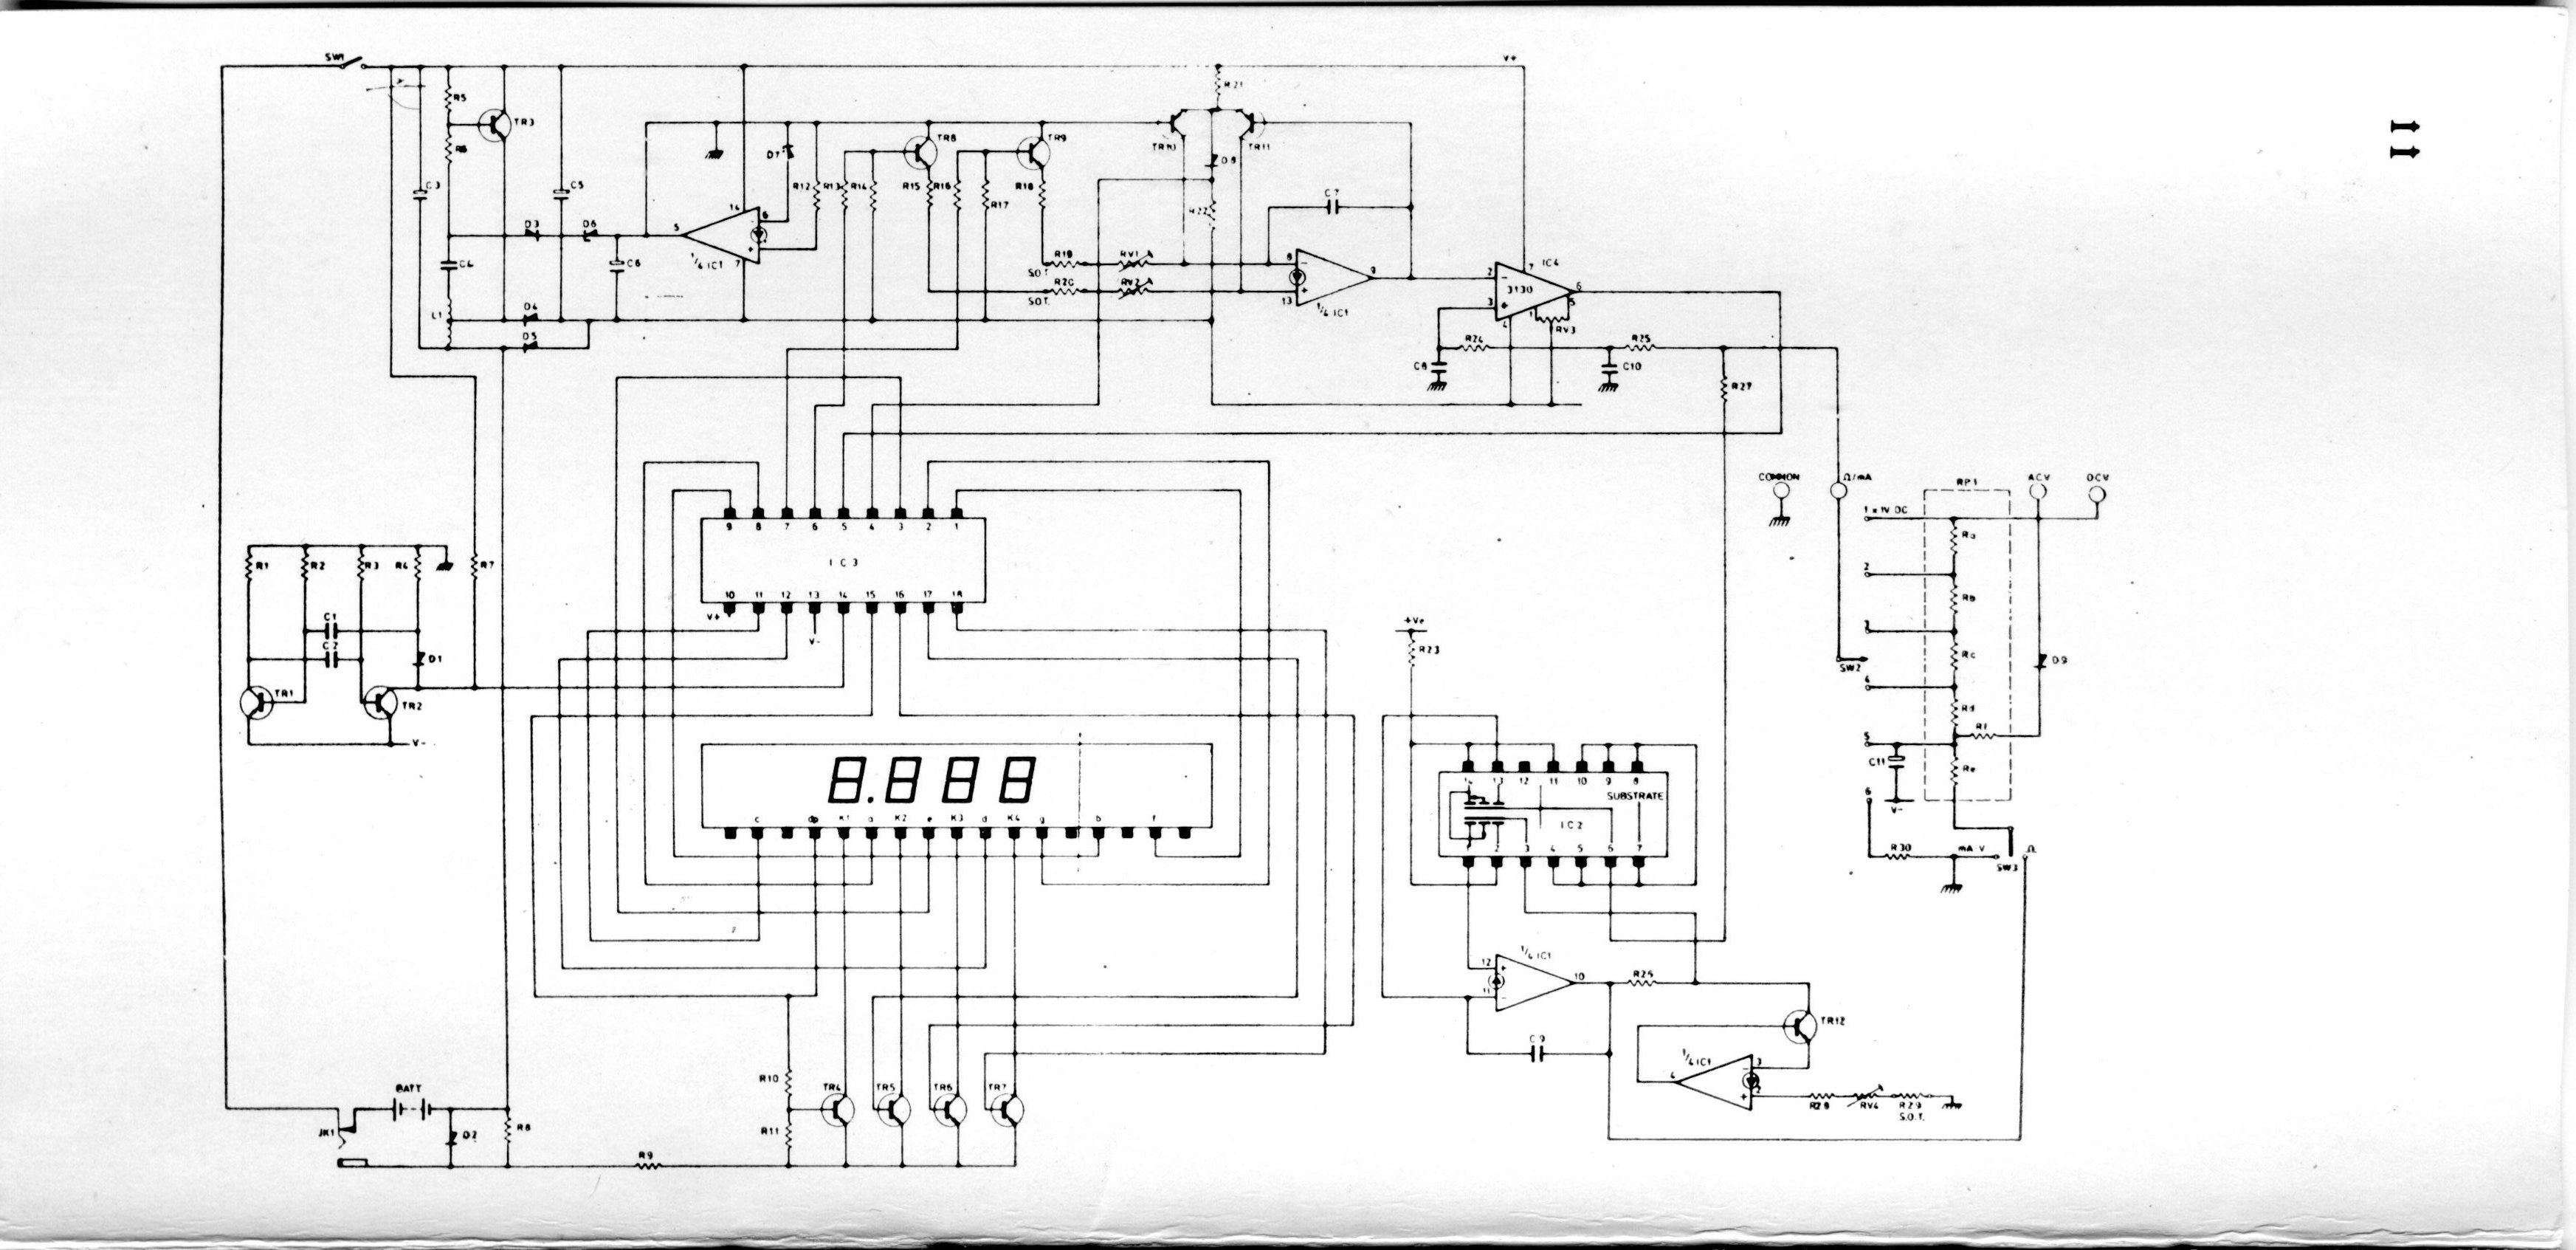 Sinclair PDM35 multimeter teardown | KuzyaTech